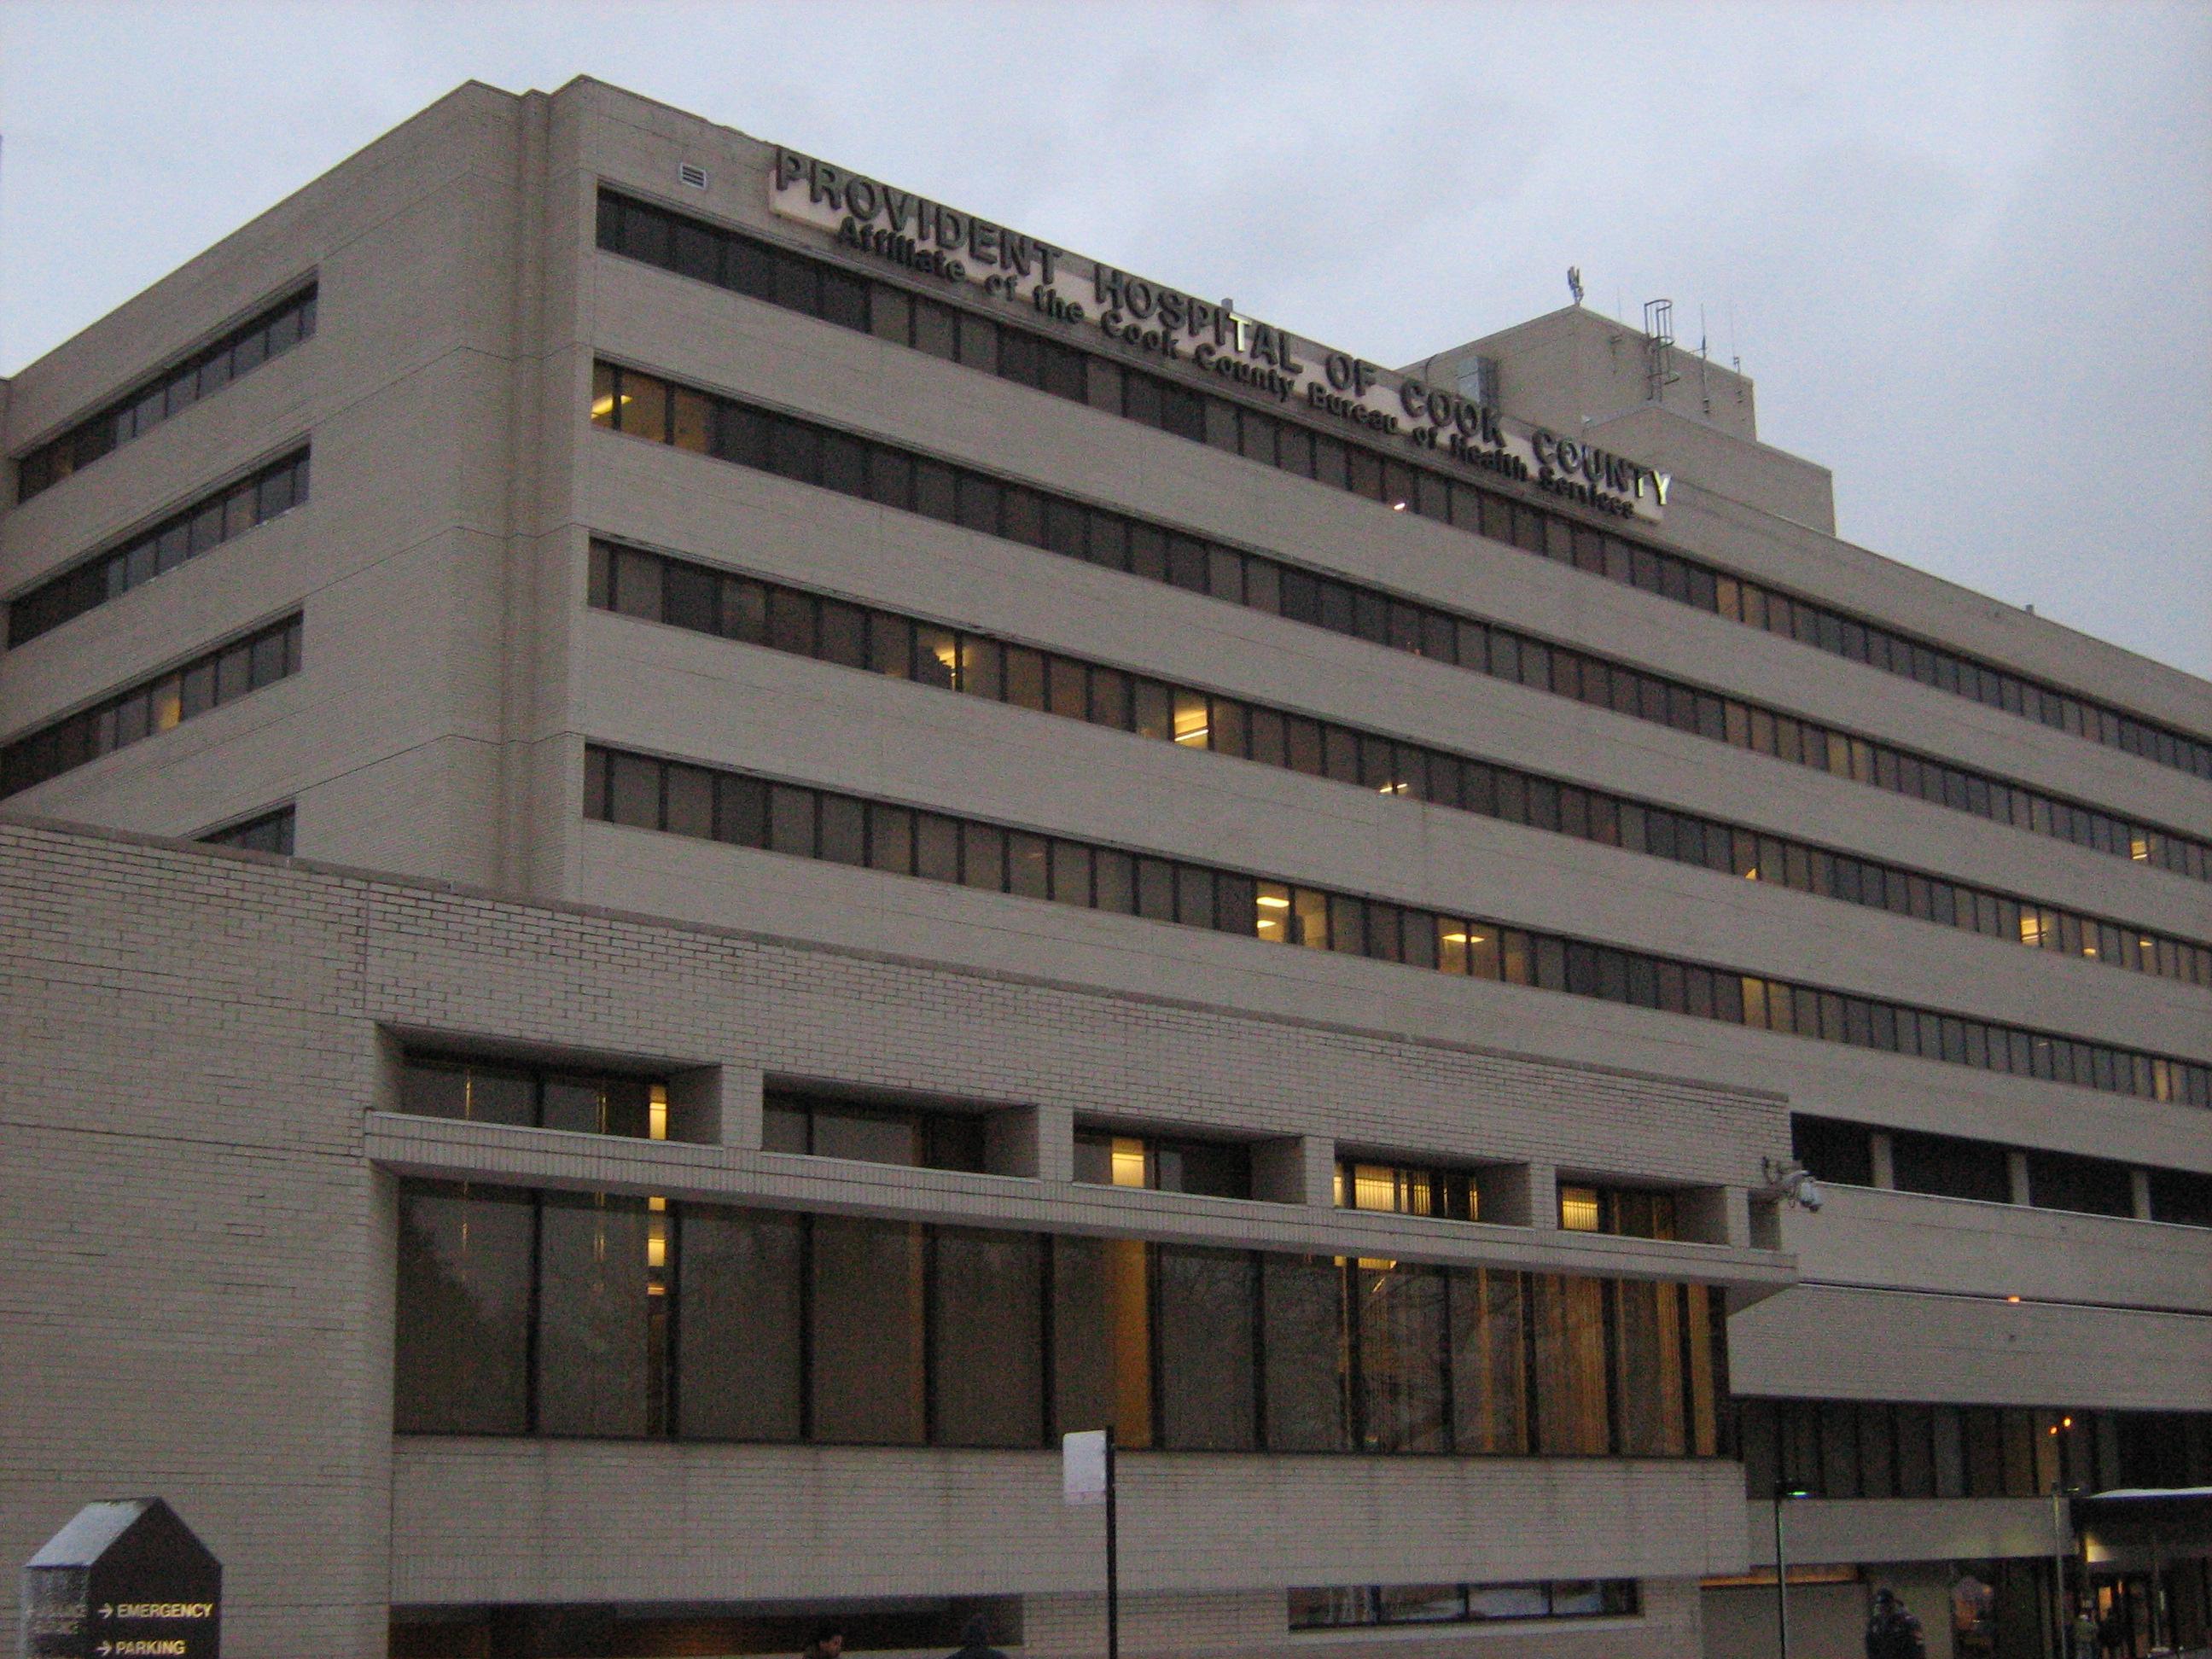 image of Provident Hospital